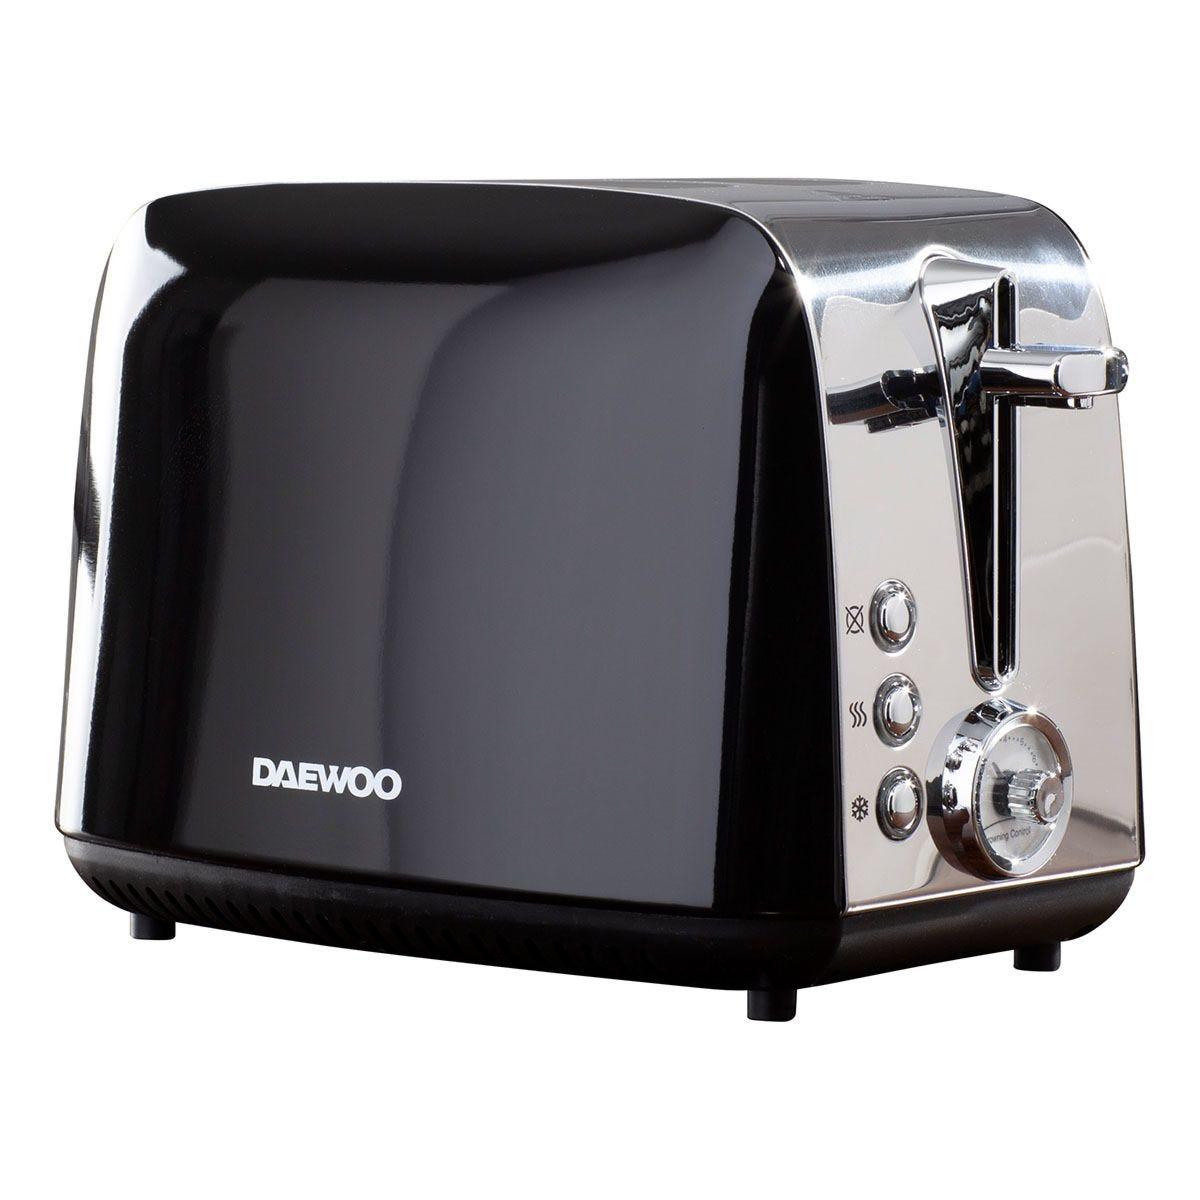 Daewoo SDA1776 Kingsbury 2100W 2-Slice Dial Toaster - Black